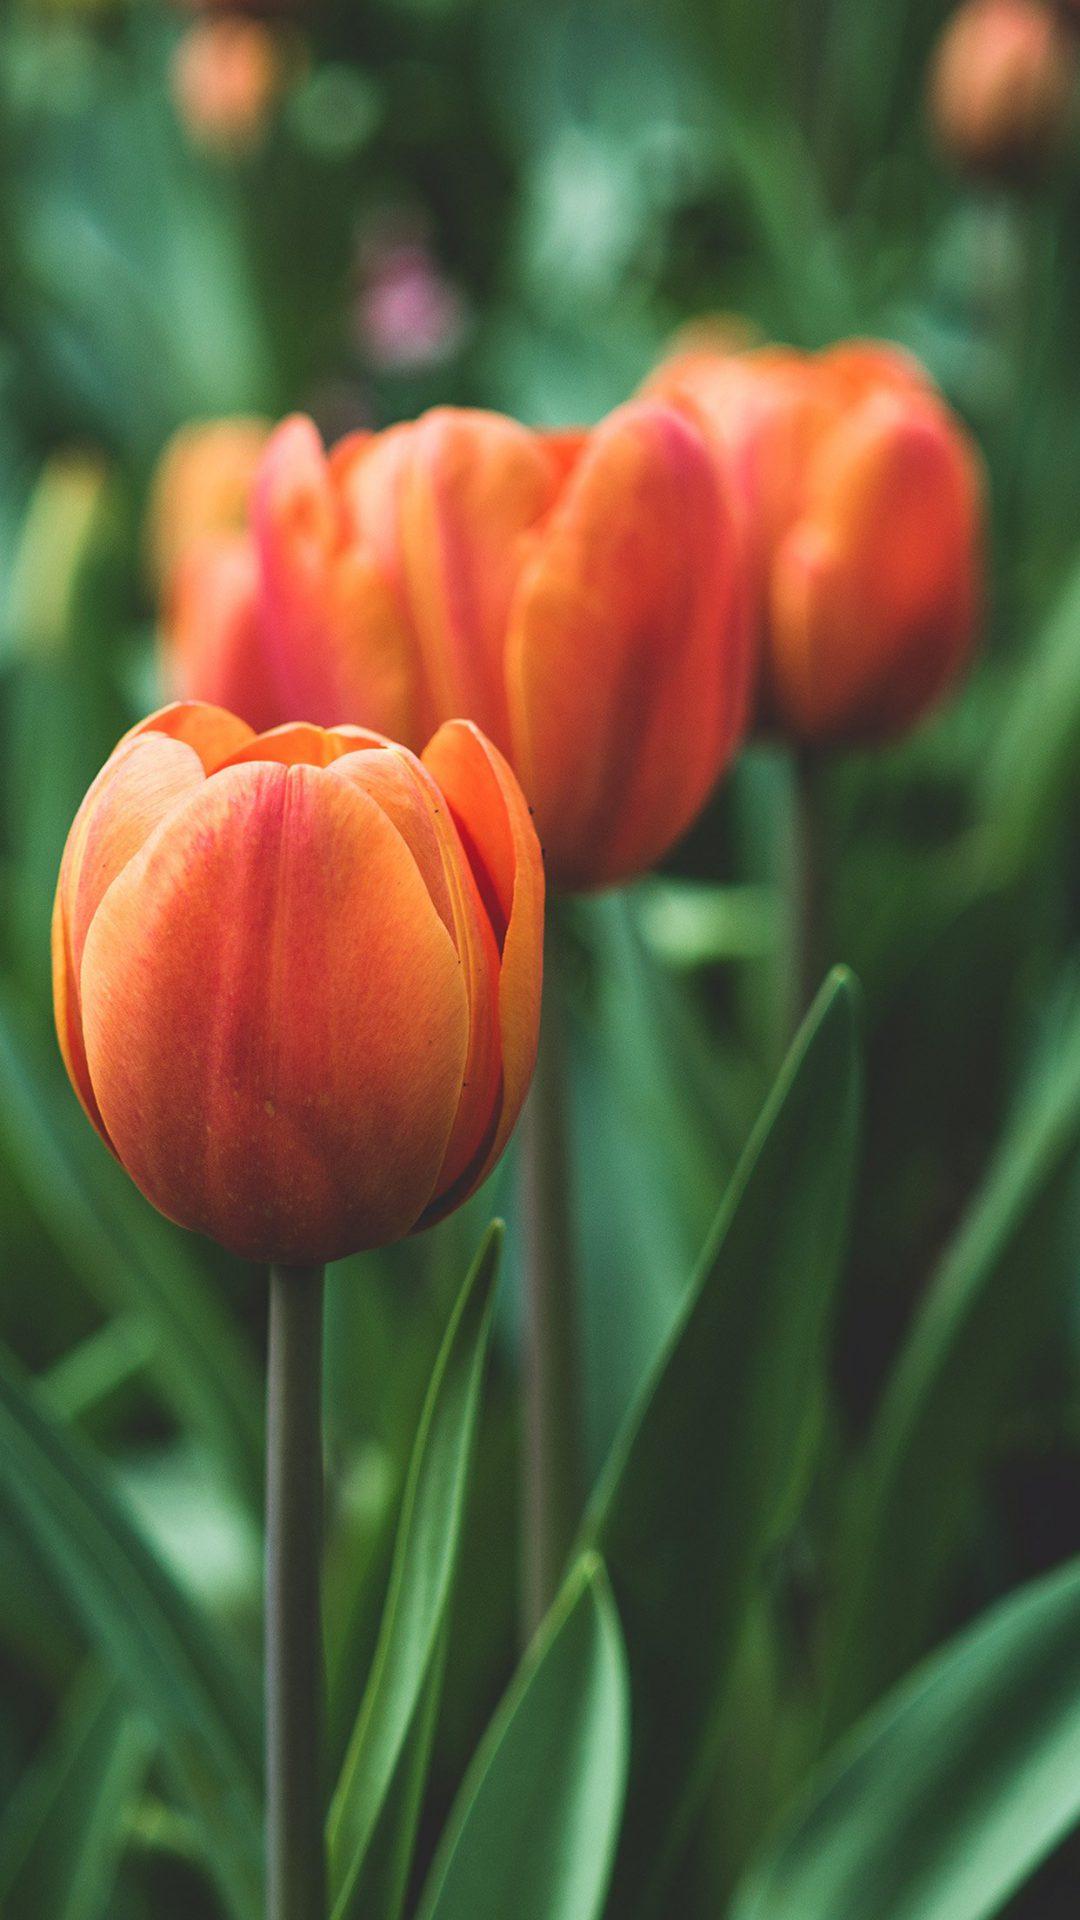 Flower Tulip Red Love Nature